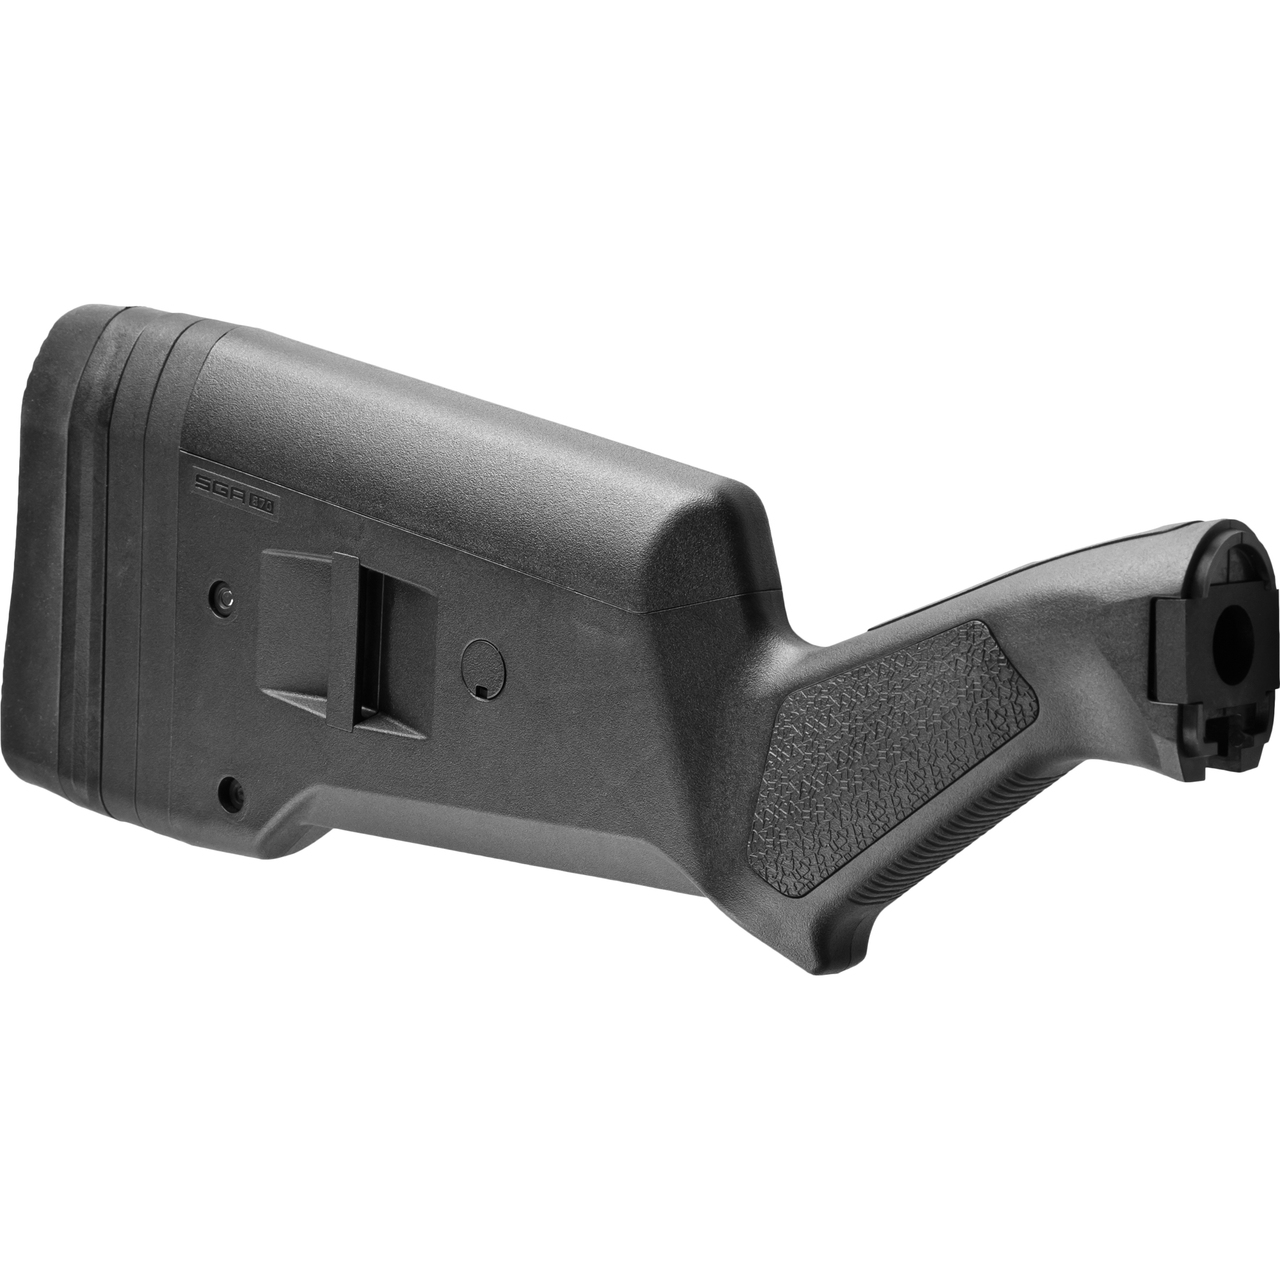 Magpul SGA Stock Remington 870 Black